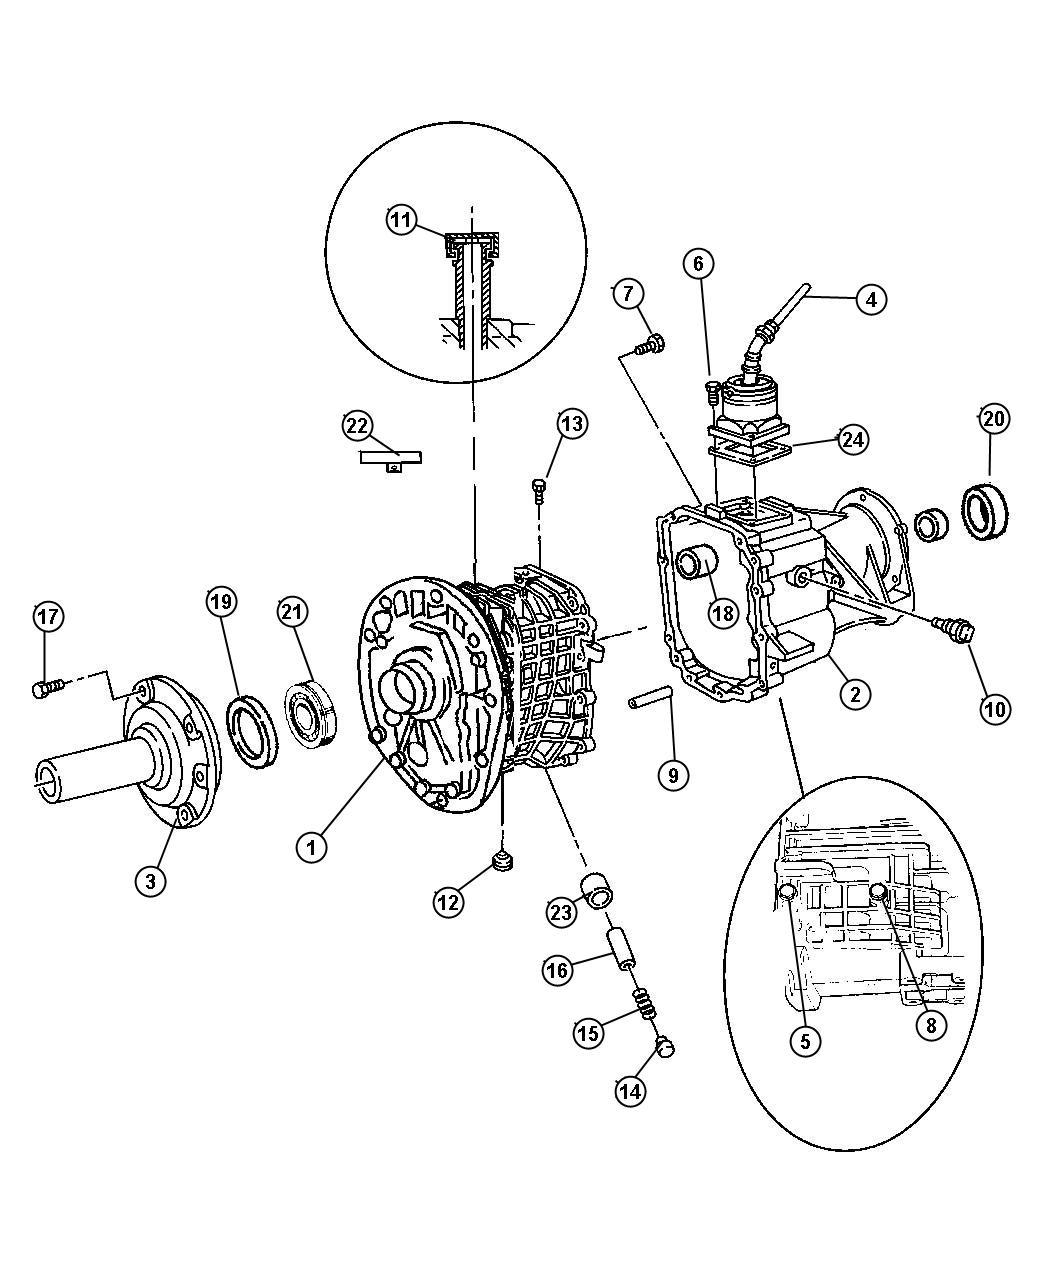 Dodge Ram 3500 Seal. Output shaft. 52108101ab, 52108101ad